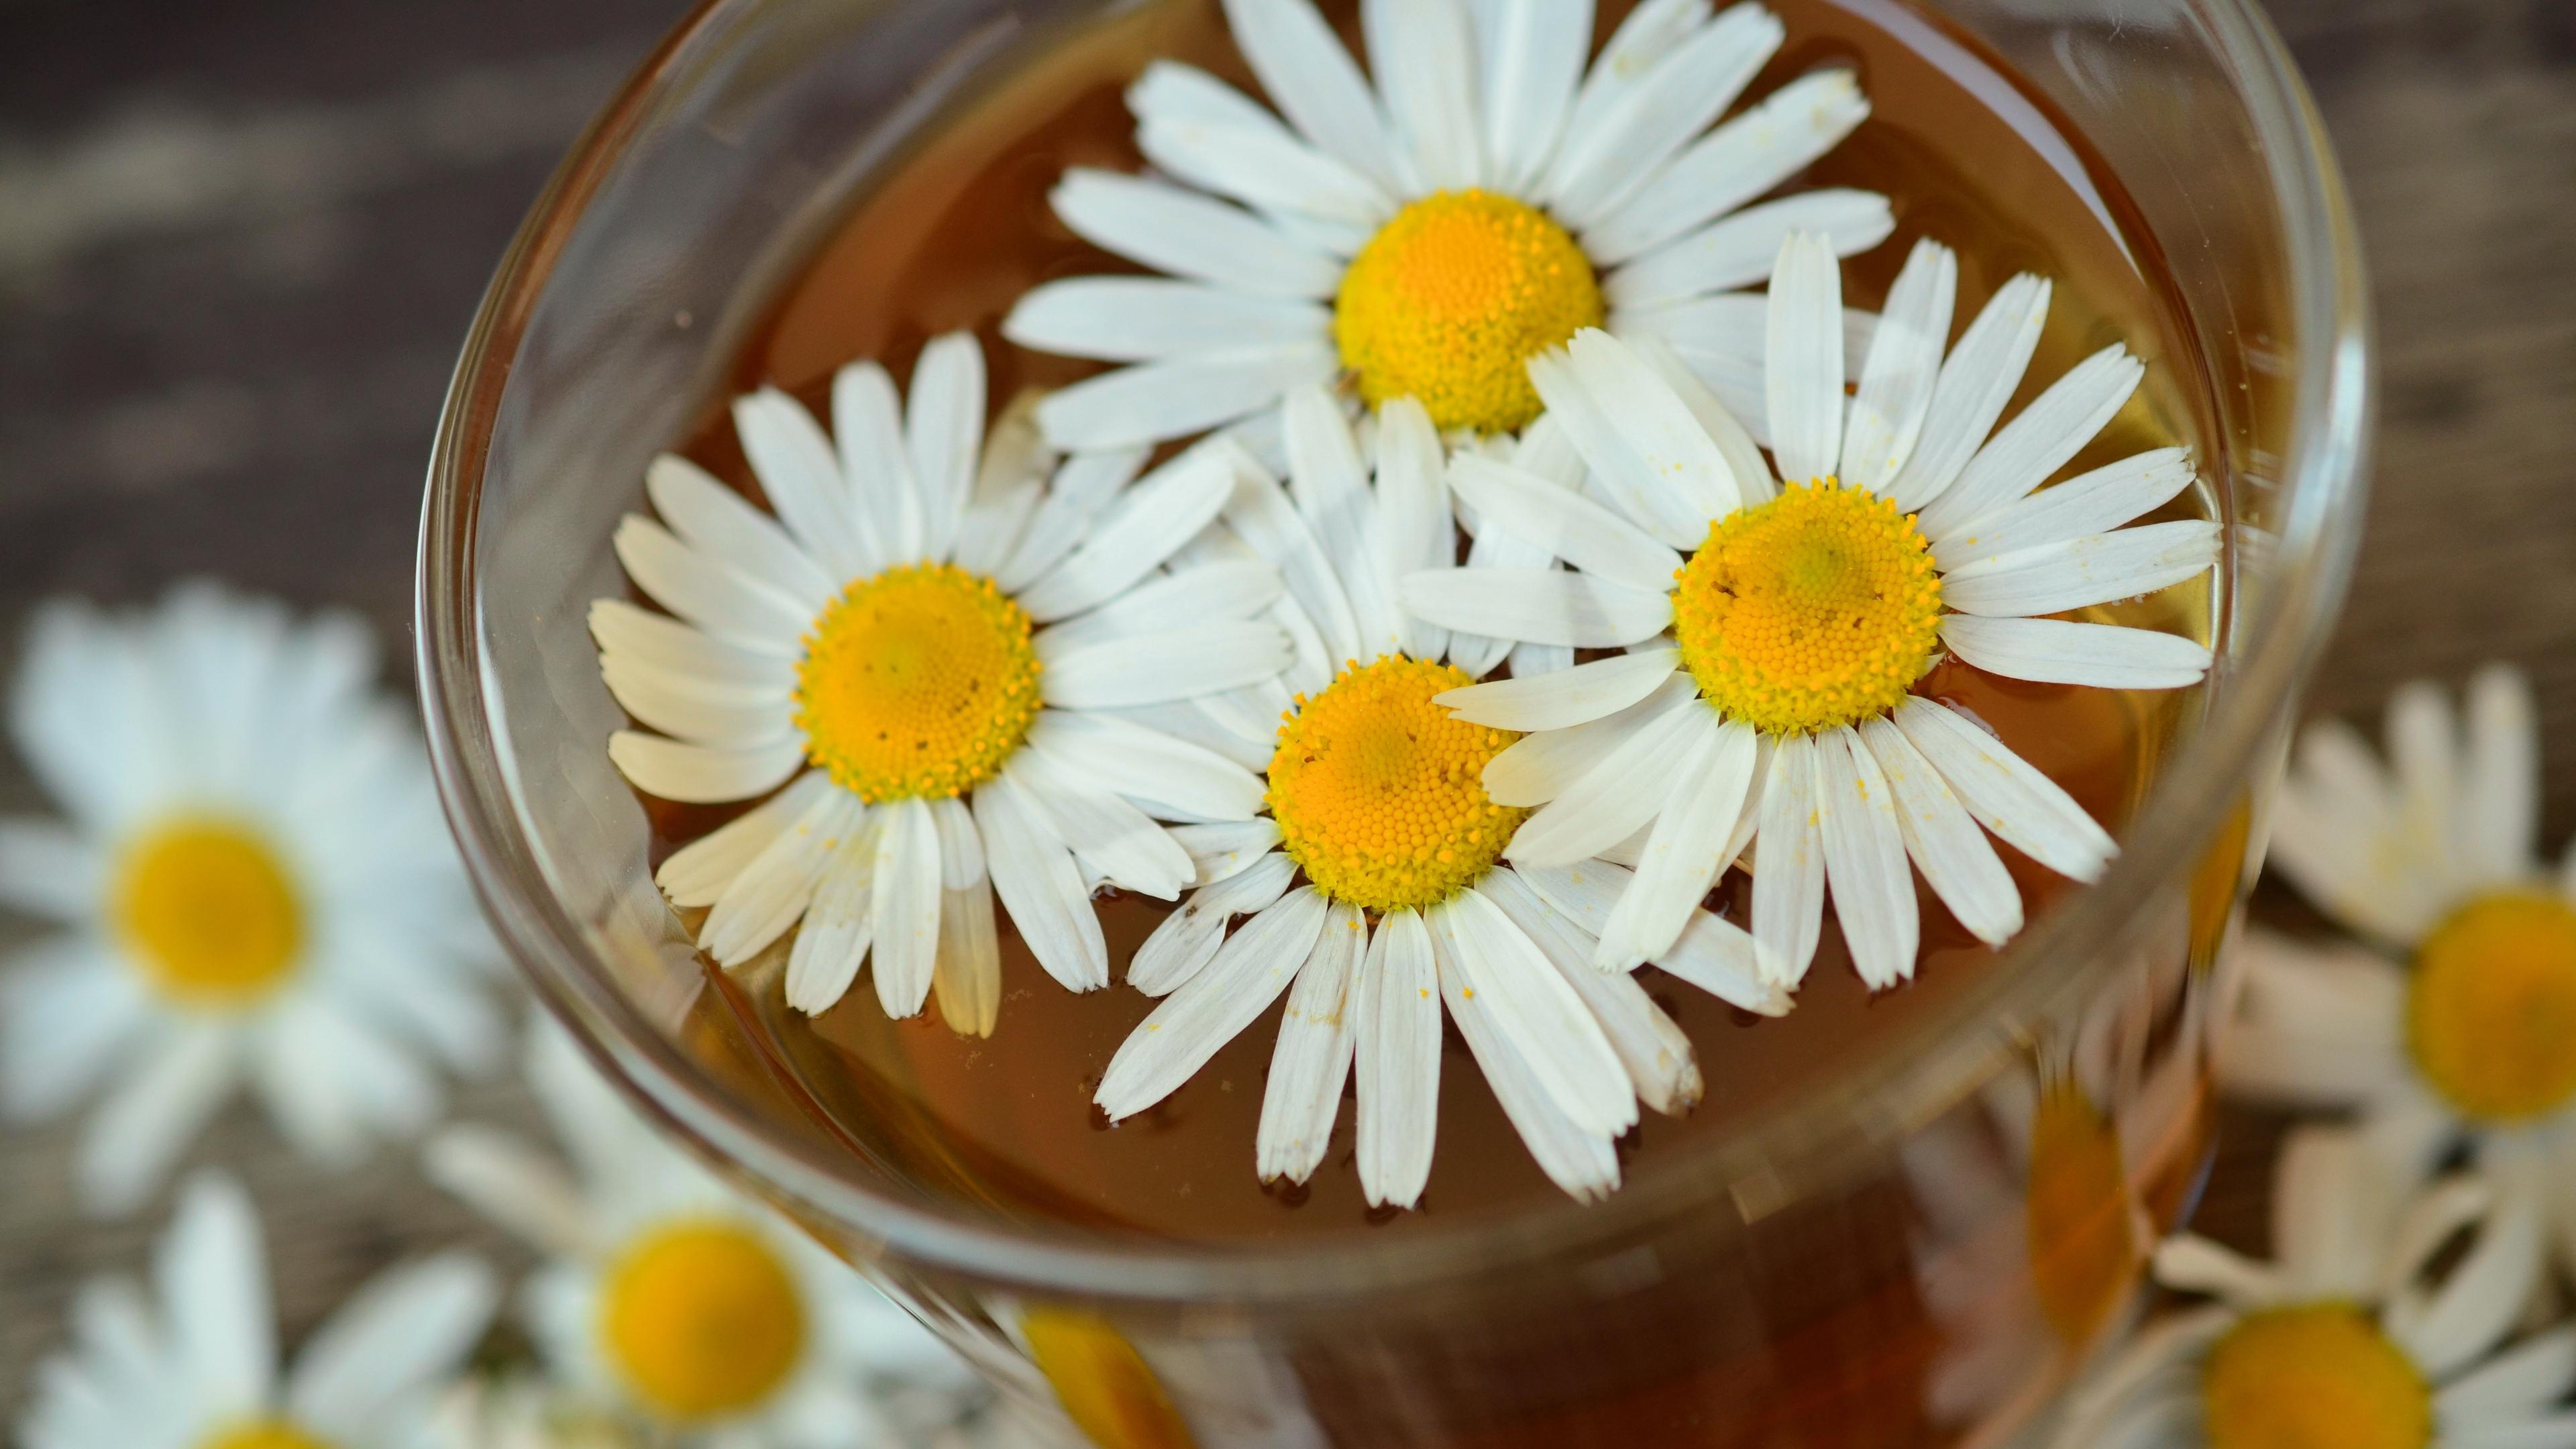 daisy drink petals 4k 1540064736 - daisy, drink, petals 4k - Petals, Drink, Daisy